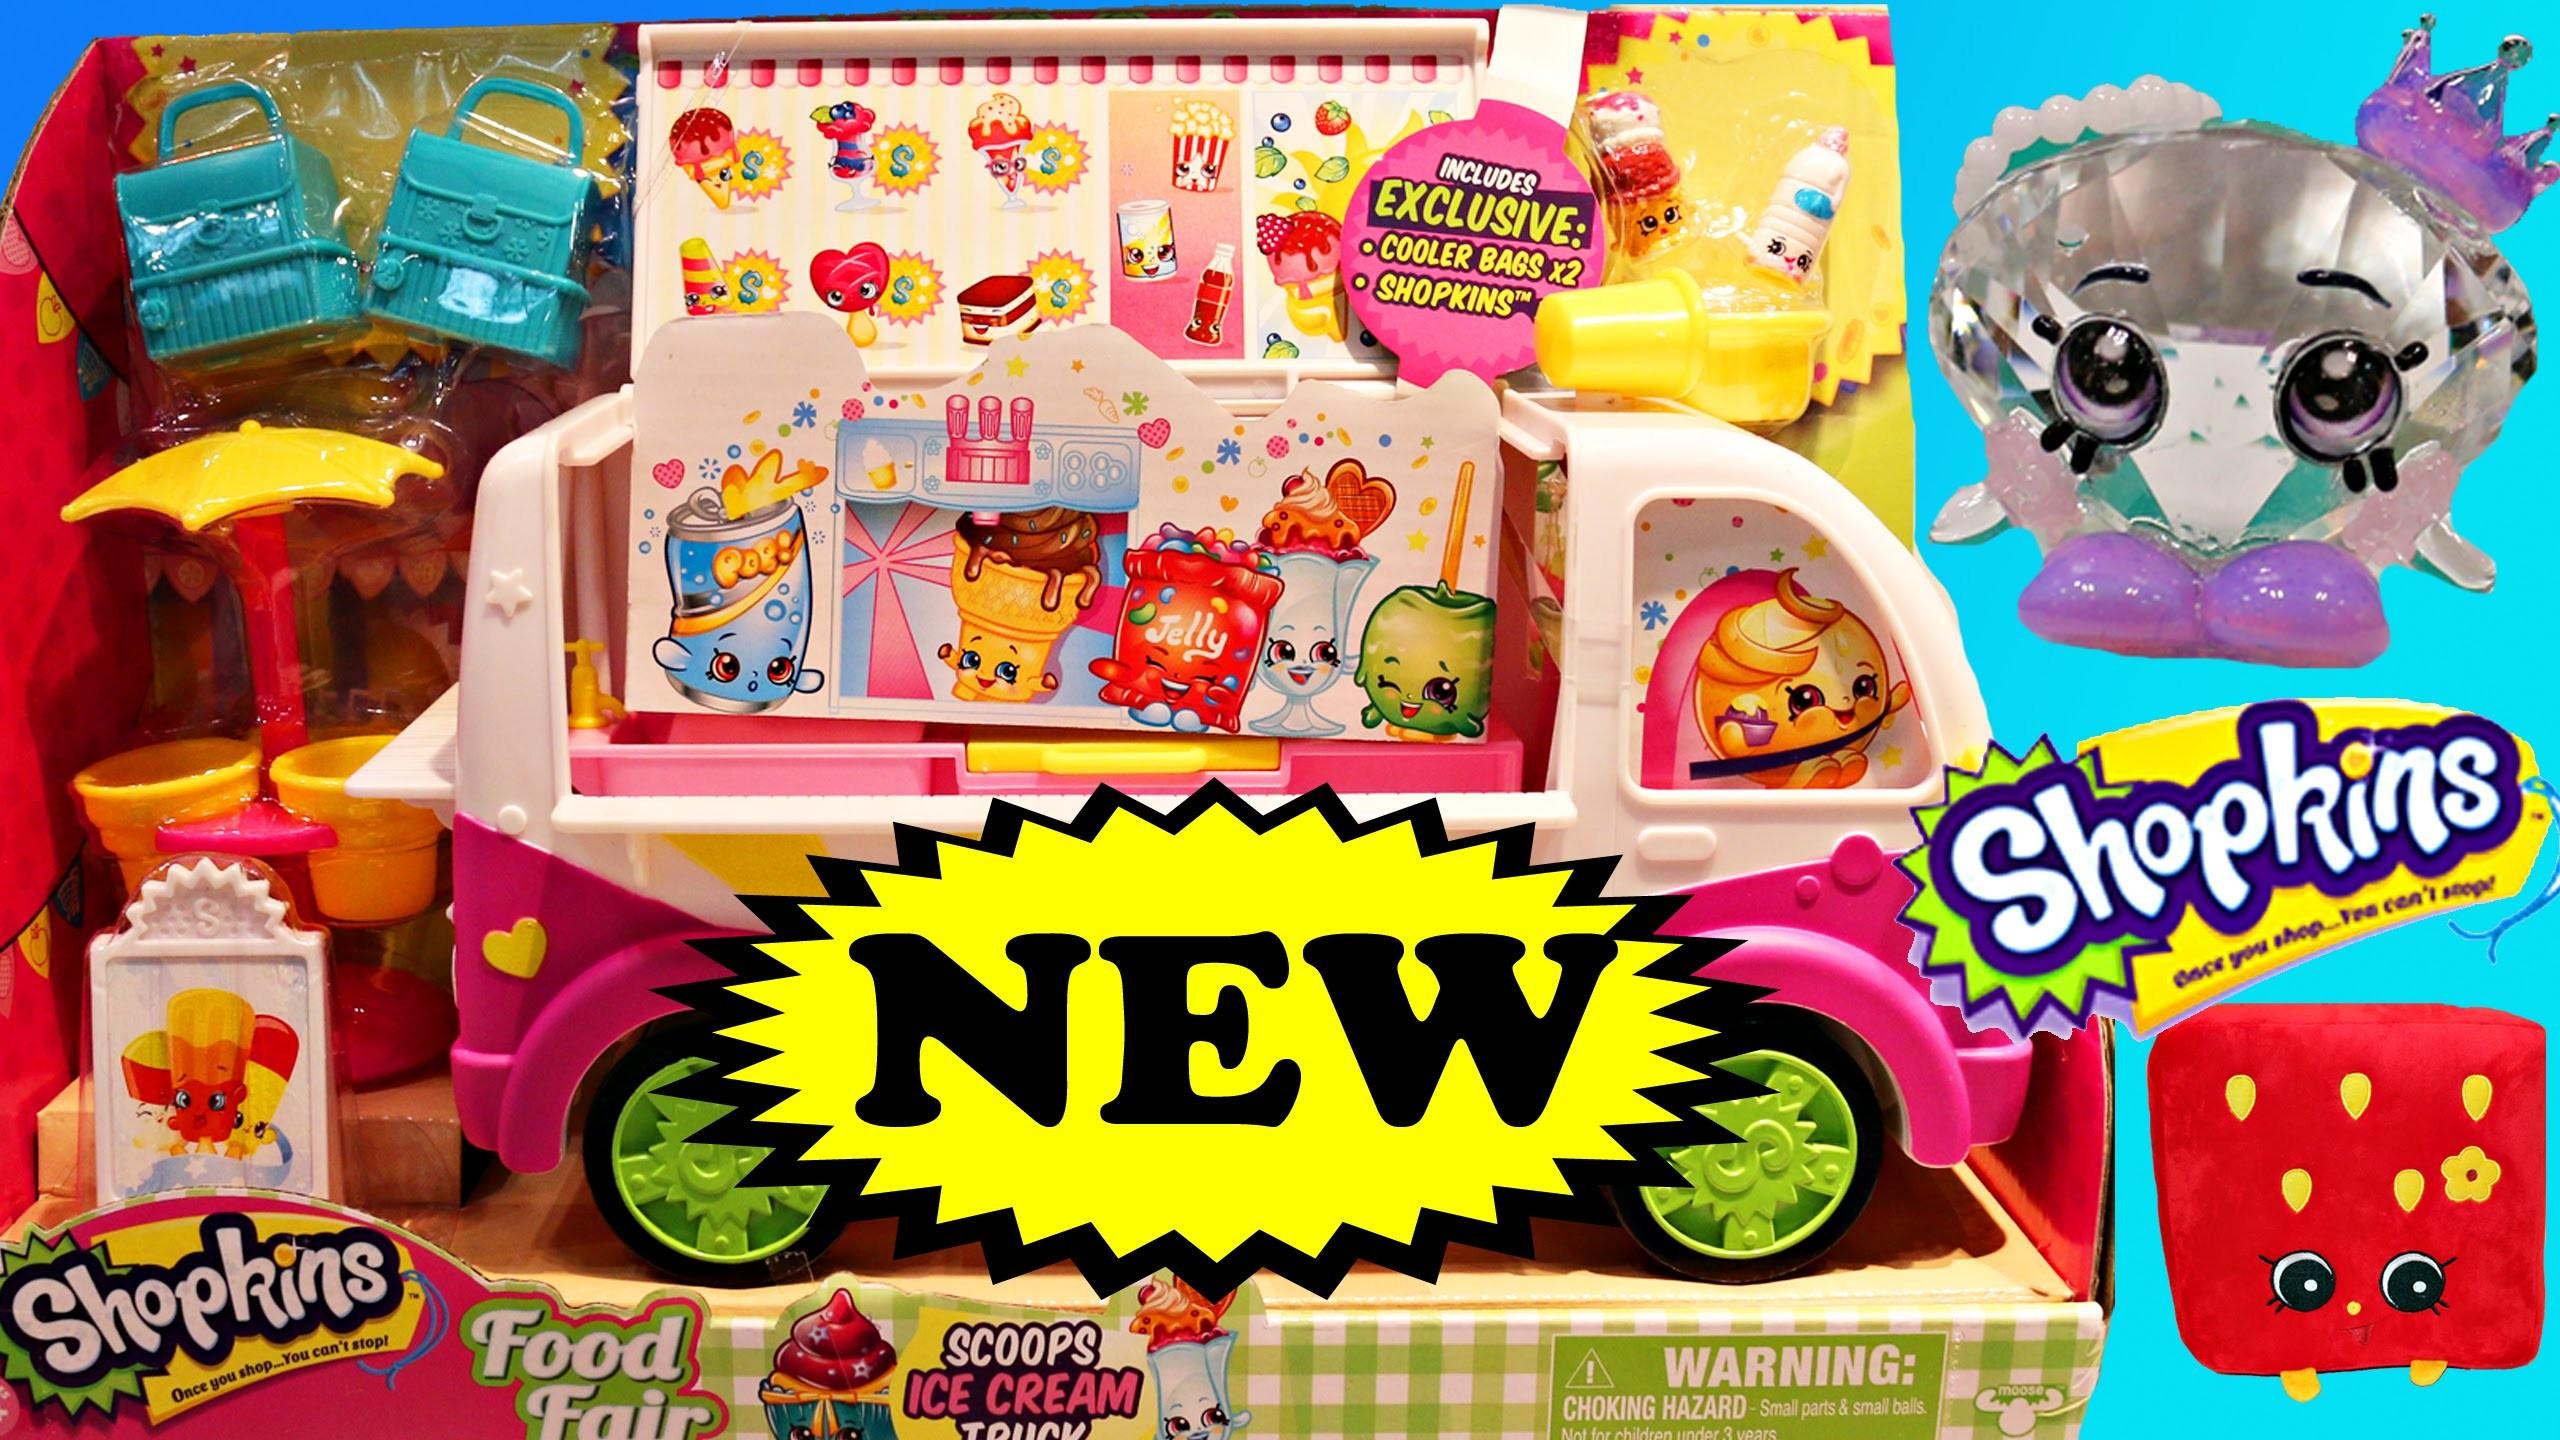 NEW SHOPKINS SEASON 3 Ice Cream Playset Special Edition Toys and New Ugglys  DisneyCarToys Toy Fair – YouTube